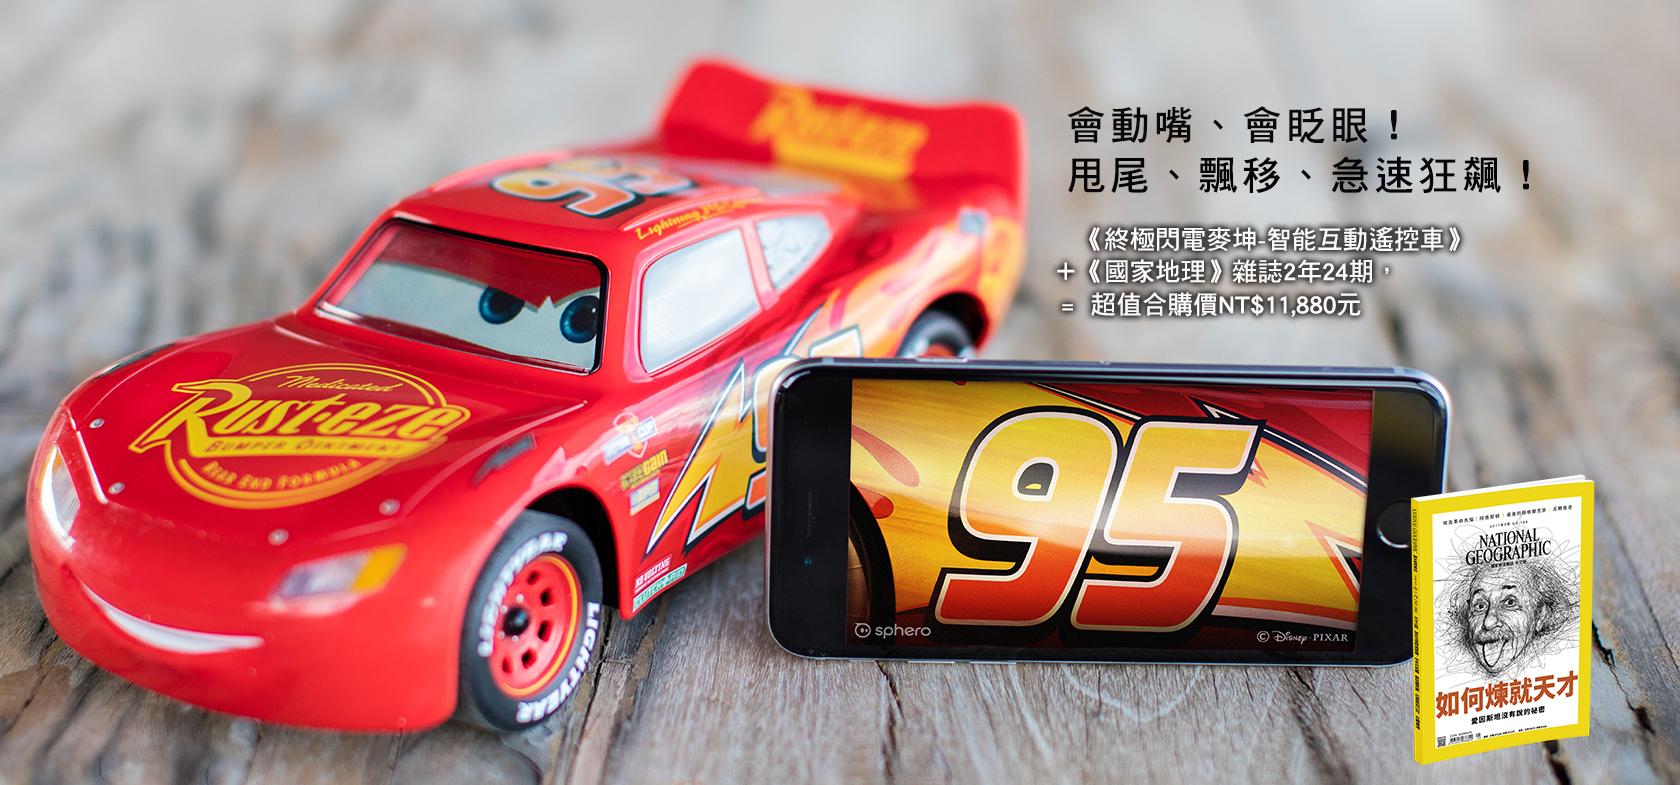 1280-545-cars-1